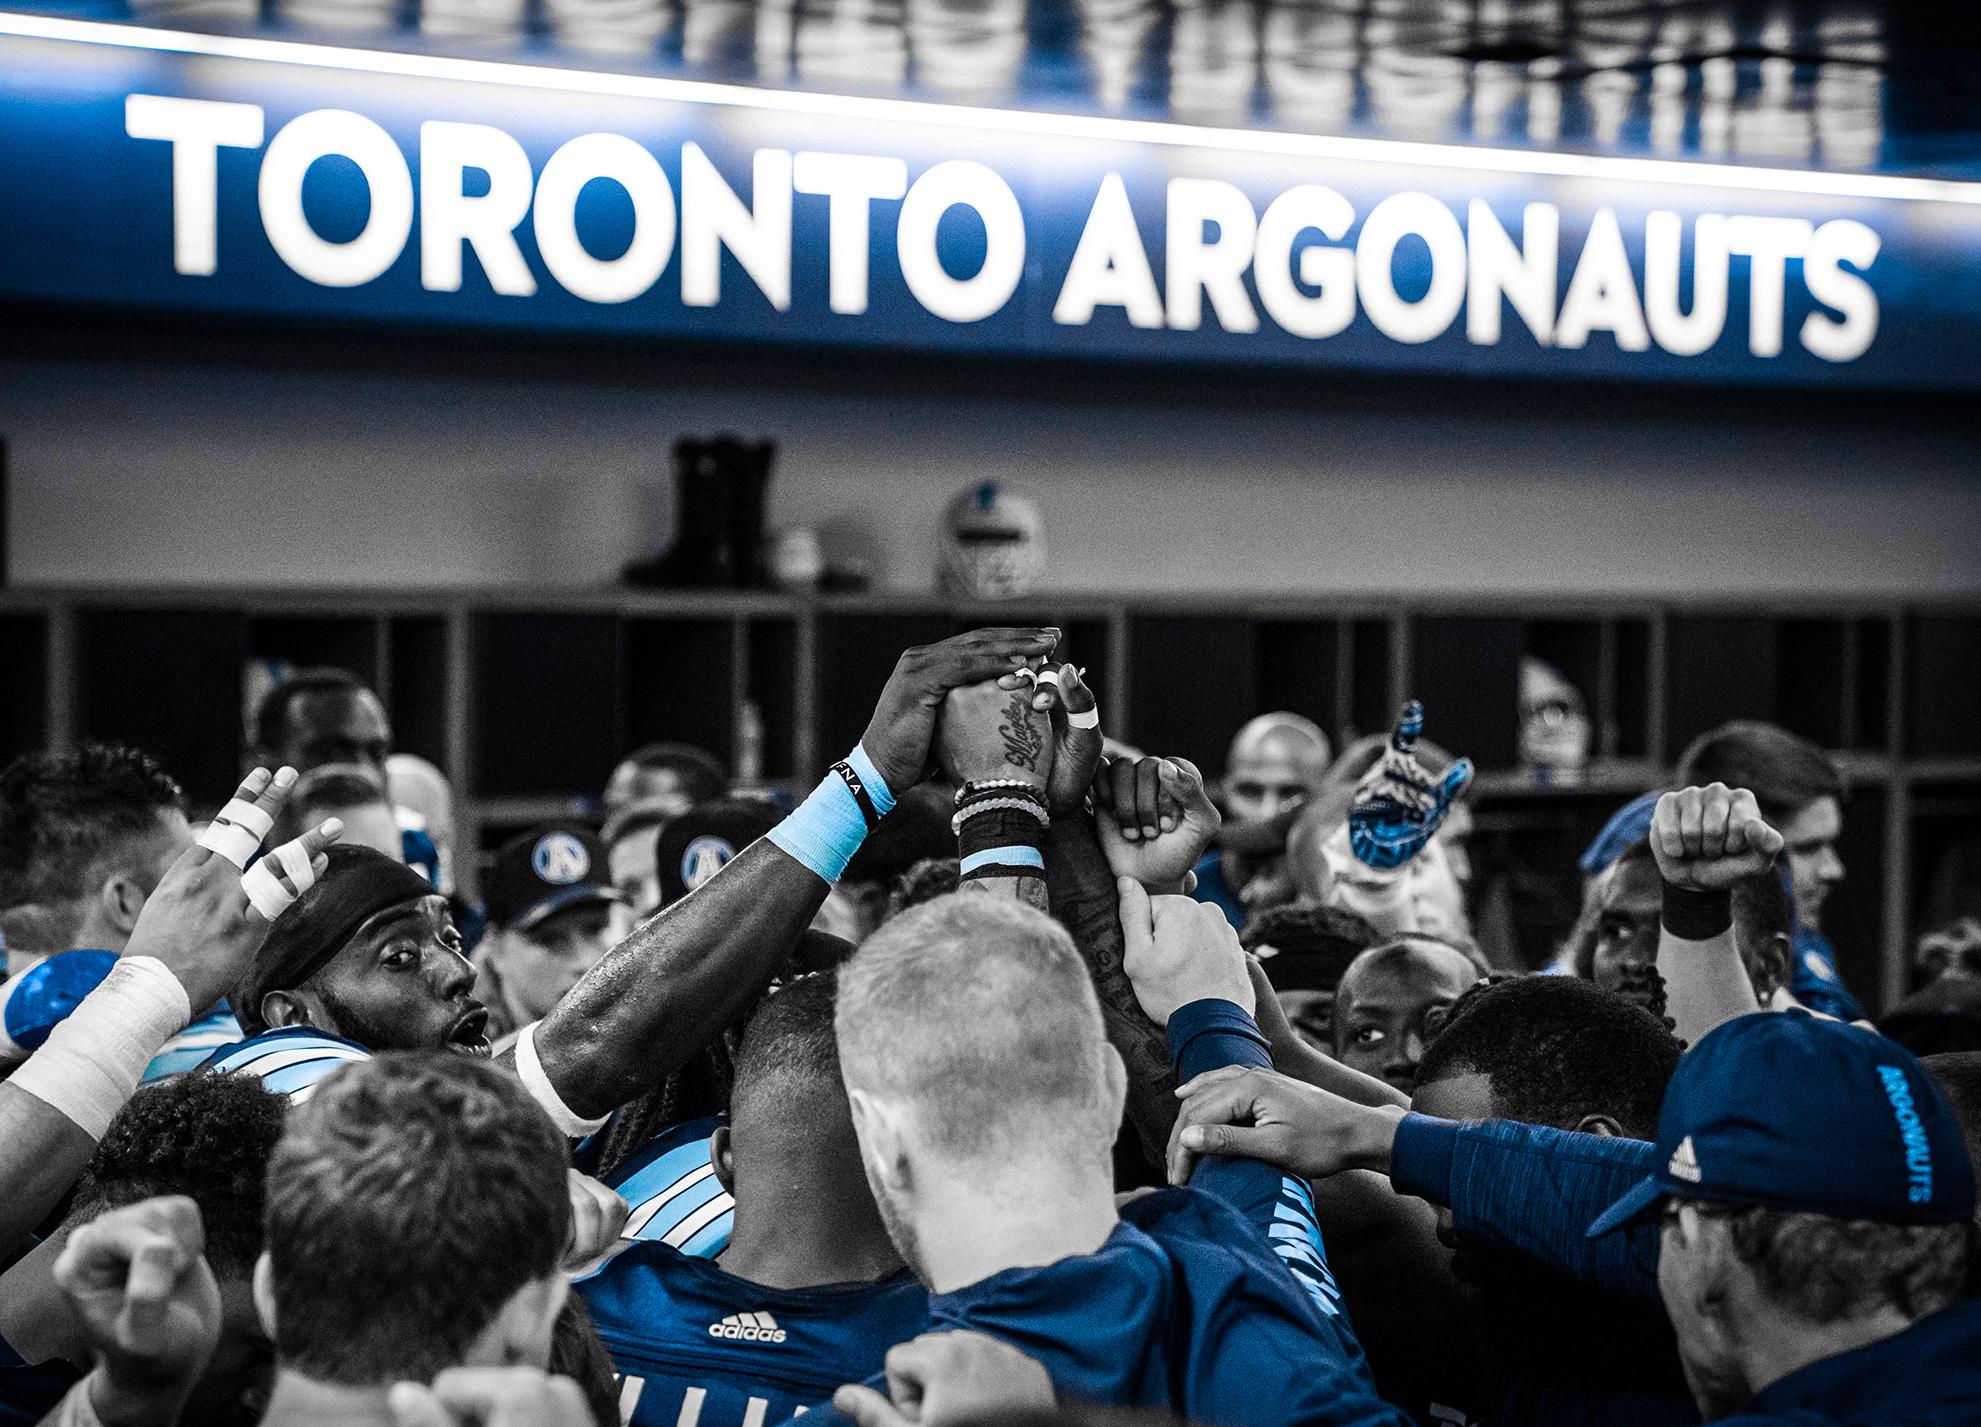 Toronto Argonauts huddle in the dressing room